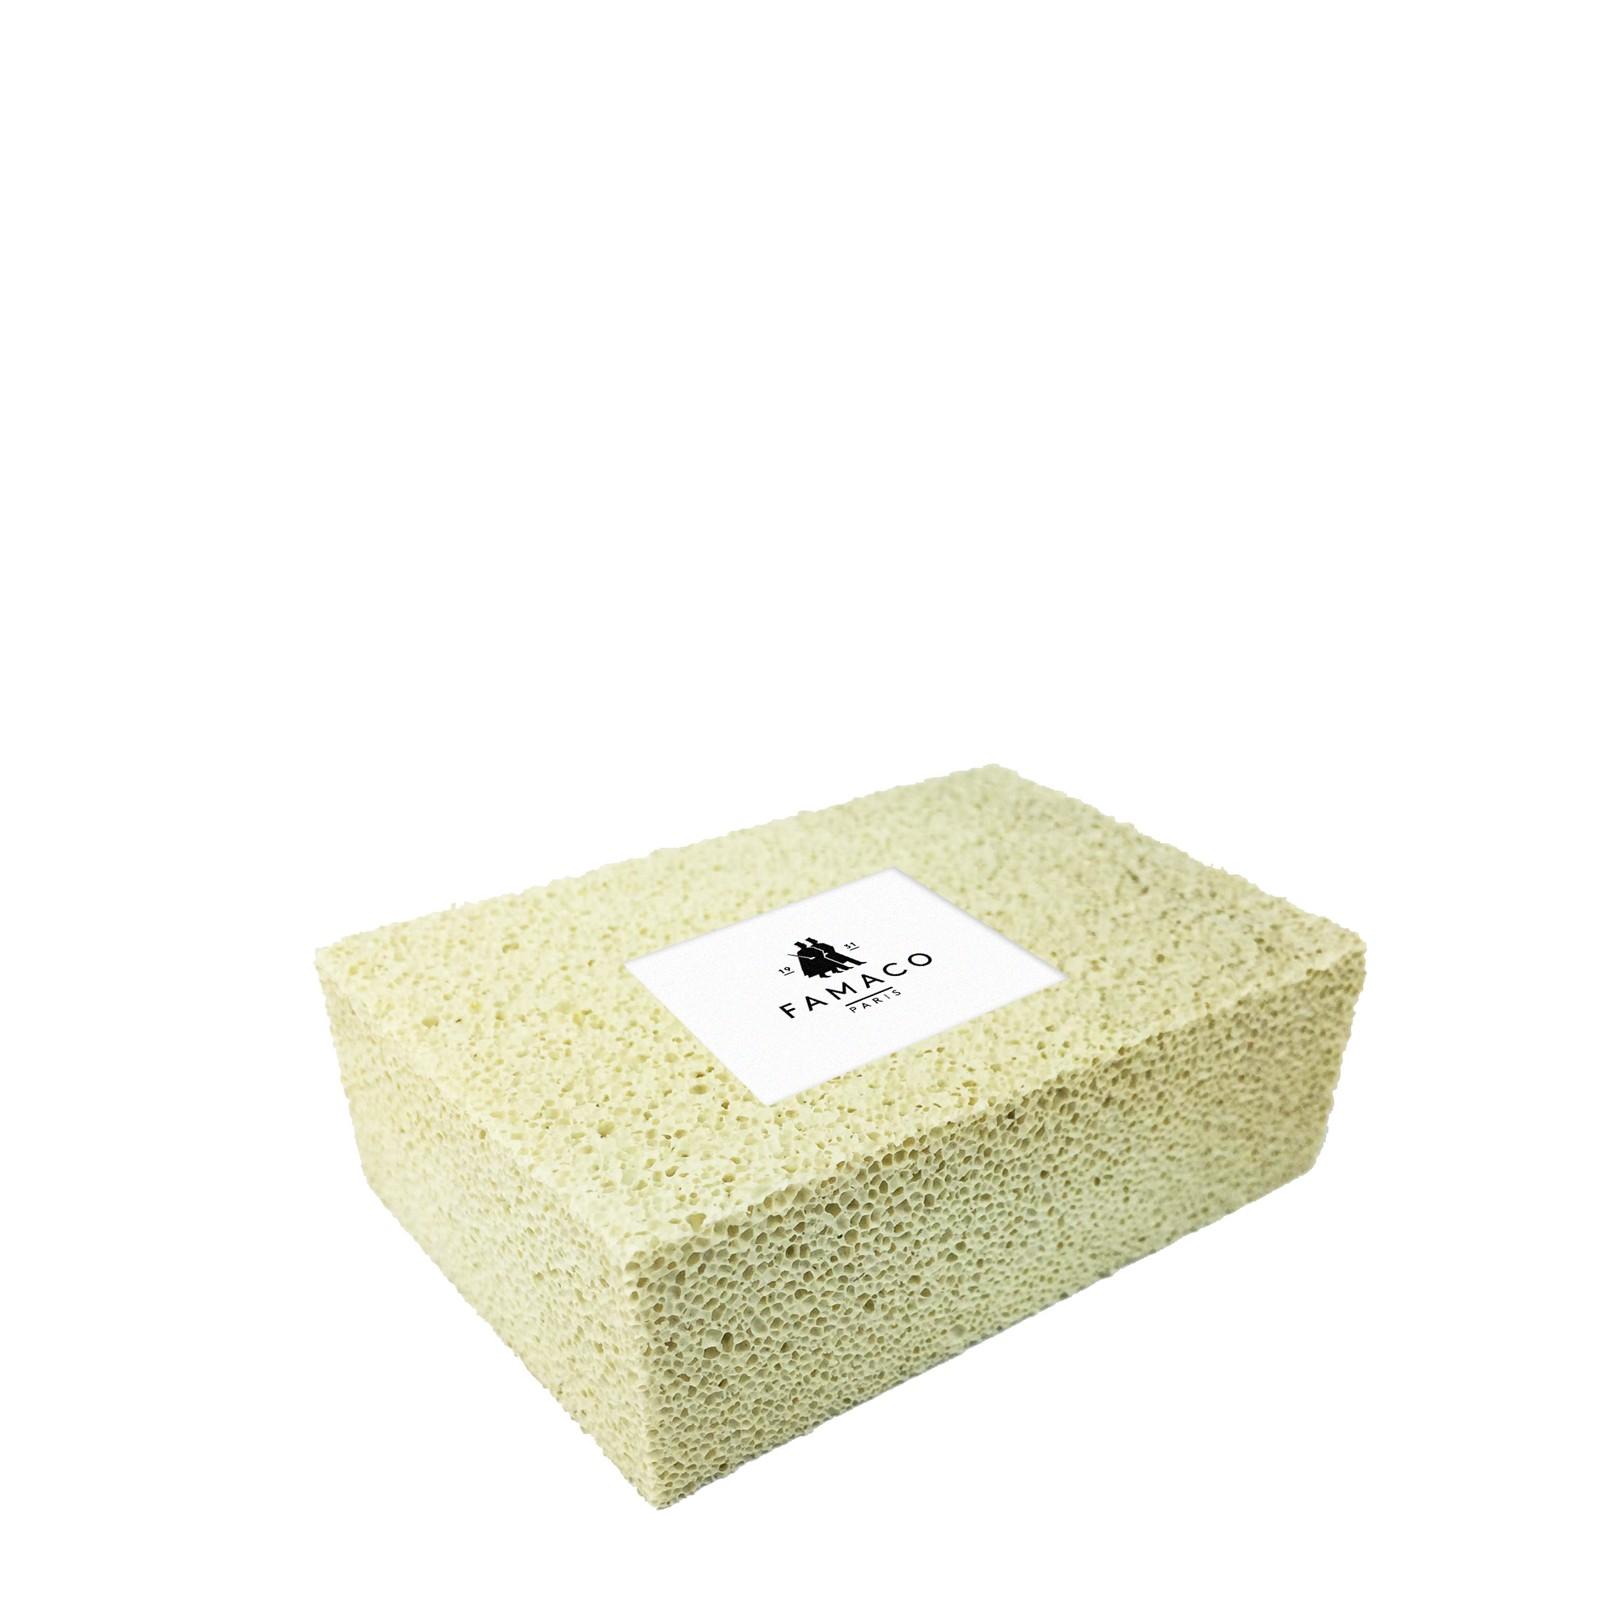 Famaco Suede Clean Sponge